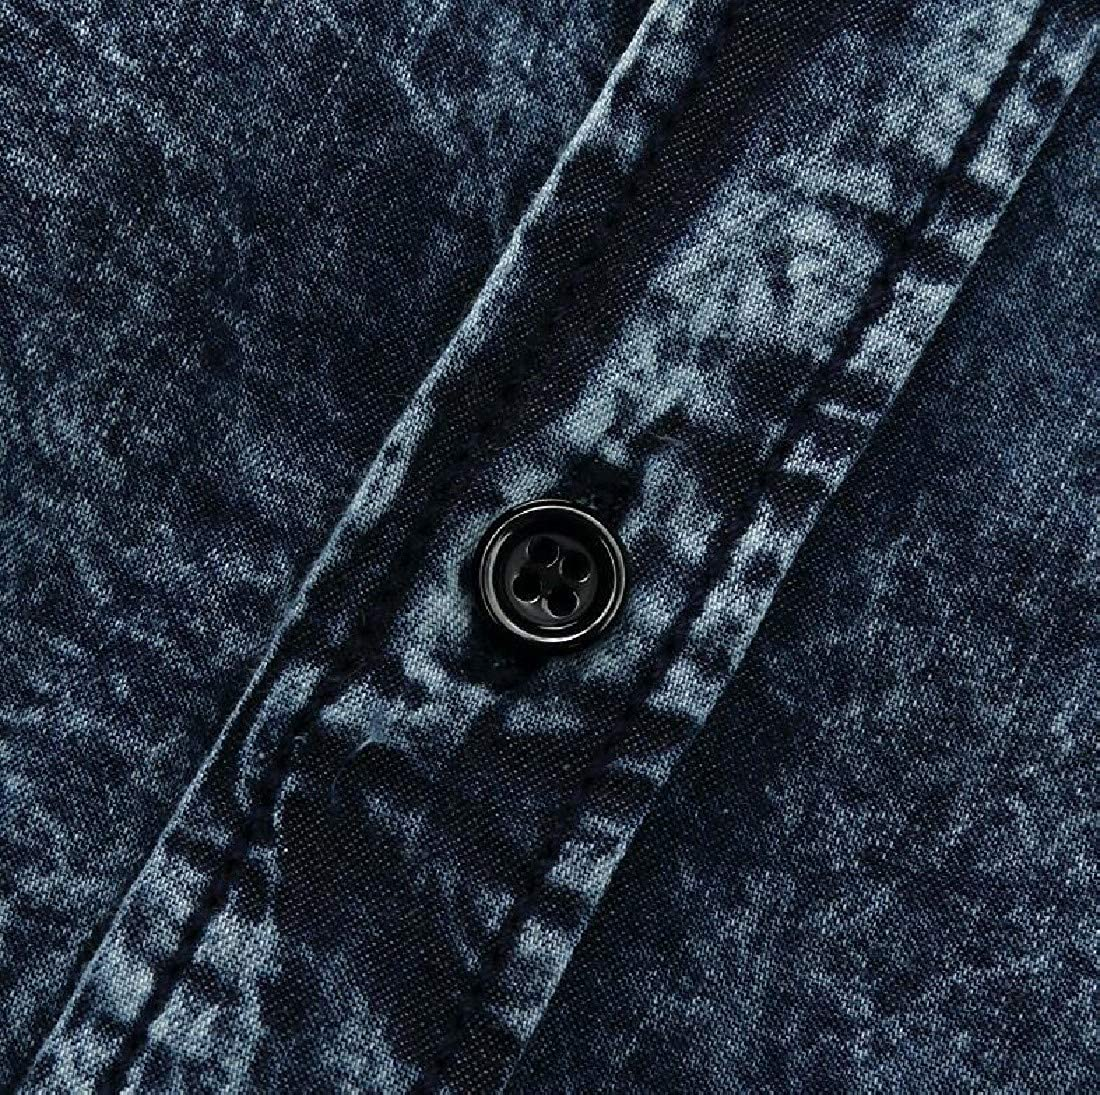 Vska Mens Short Sleeves Button Down Denim Turn-Down Collar Western Shirt